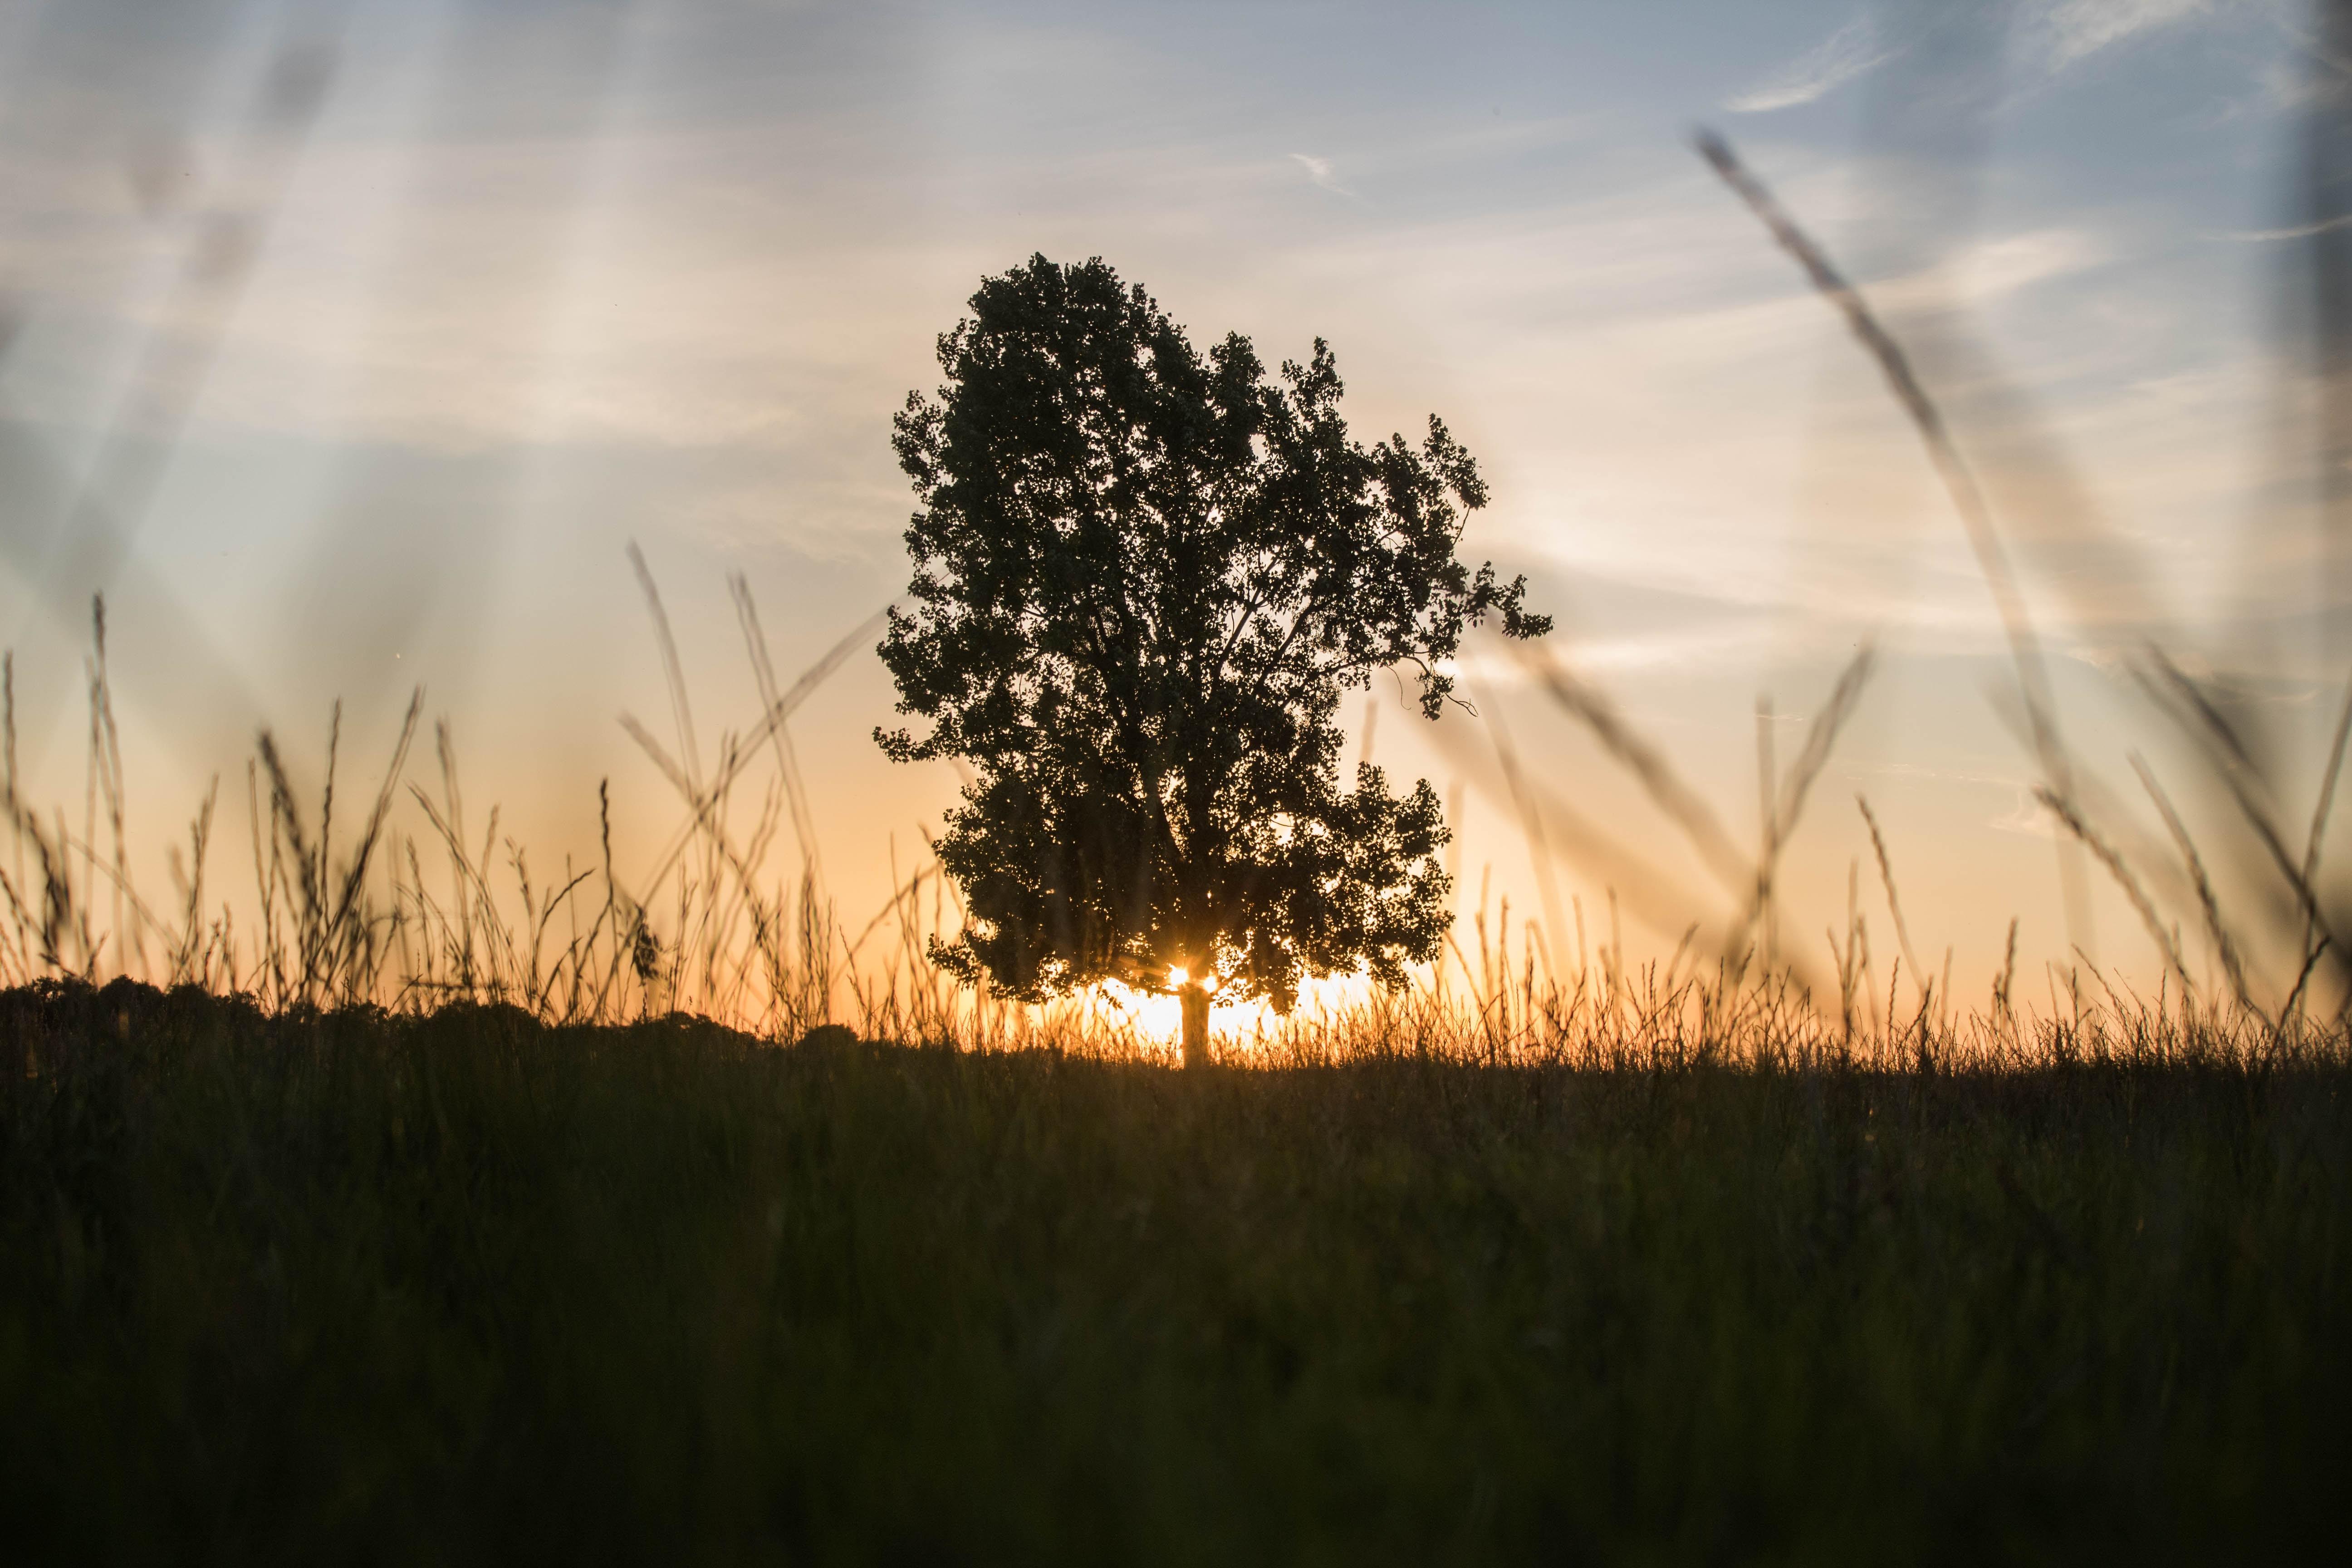 tree silhouette under golden hour